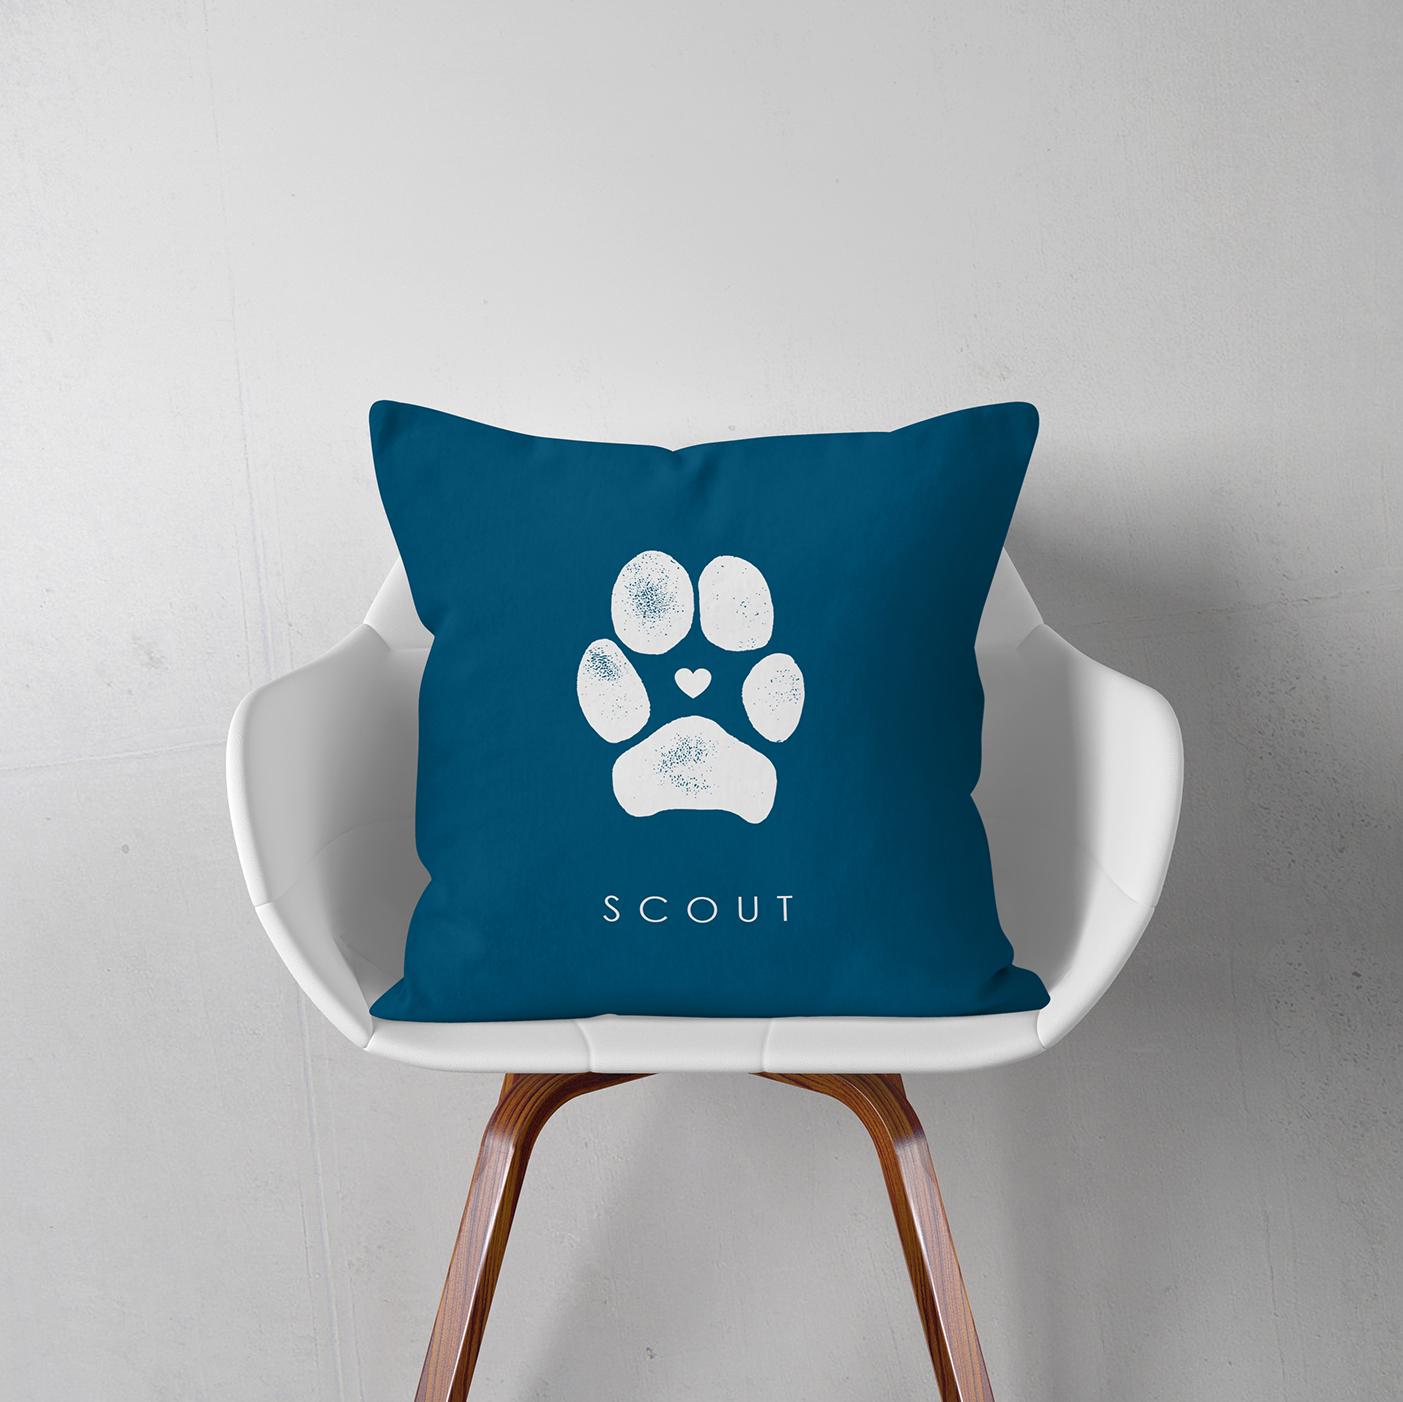 Personalized Pet Paw Pillow - FlutterBye Prints